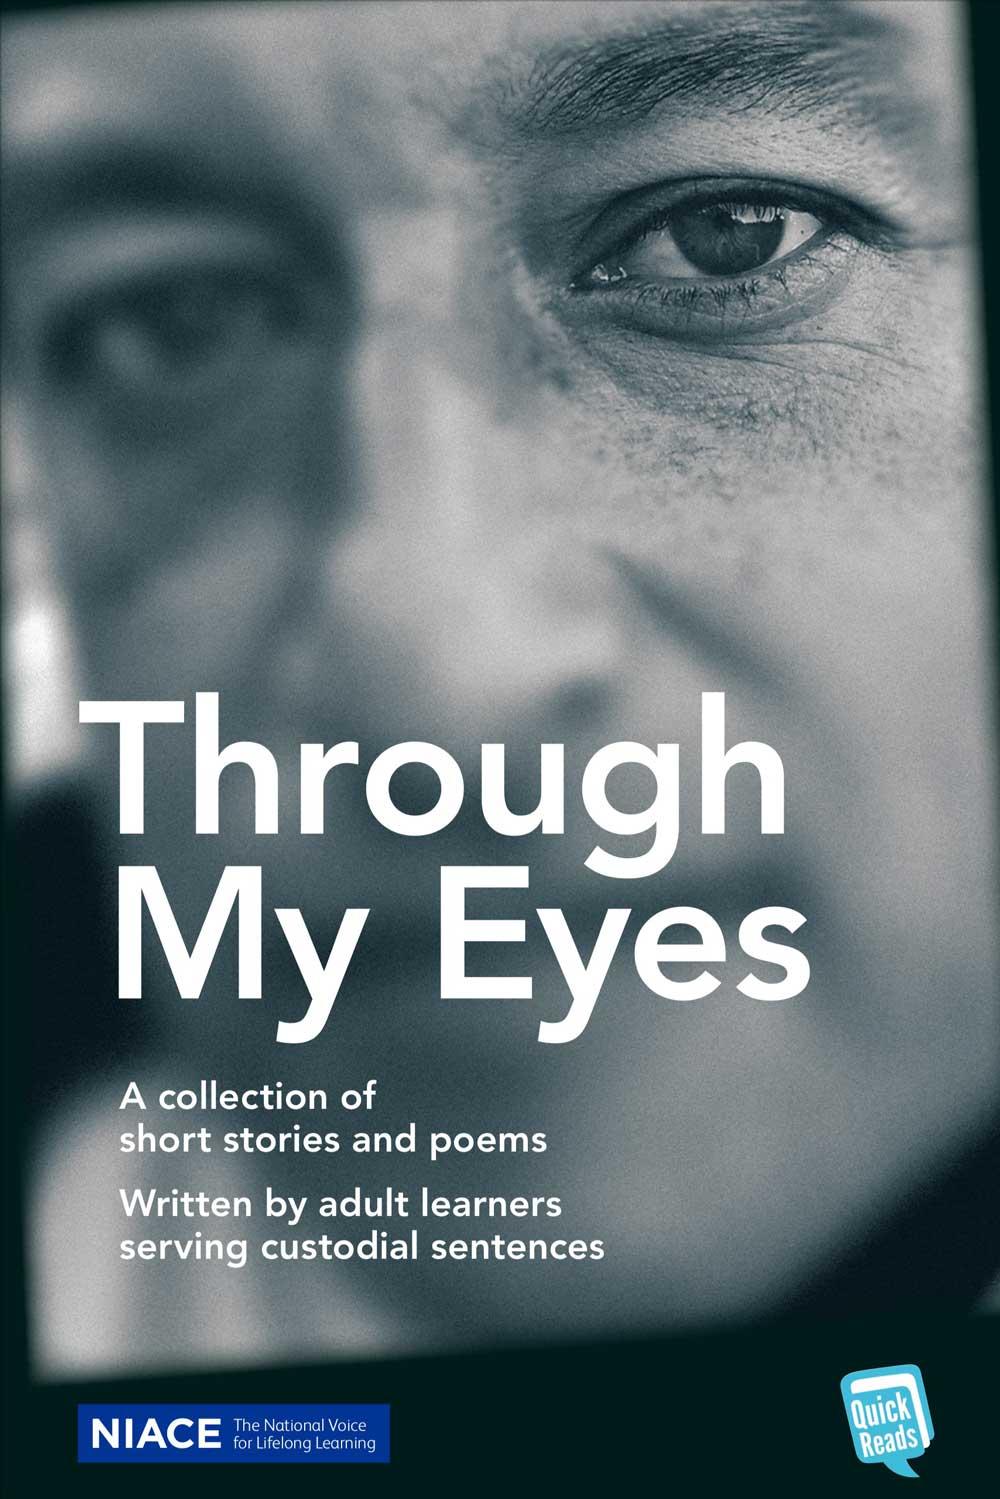 Through My Eyes book cover design